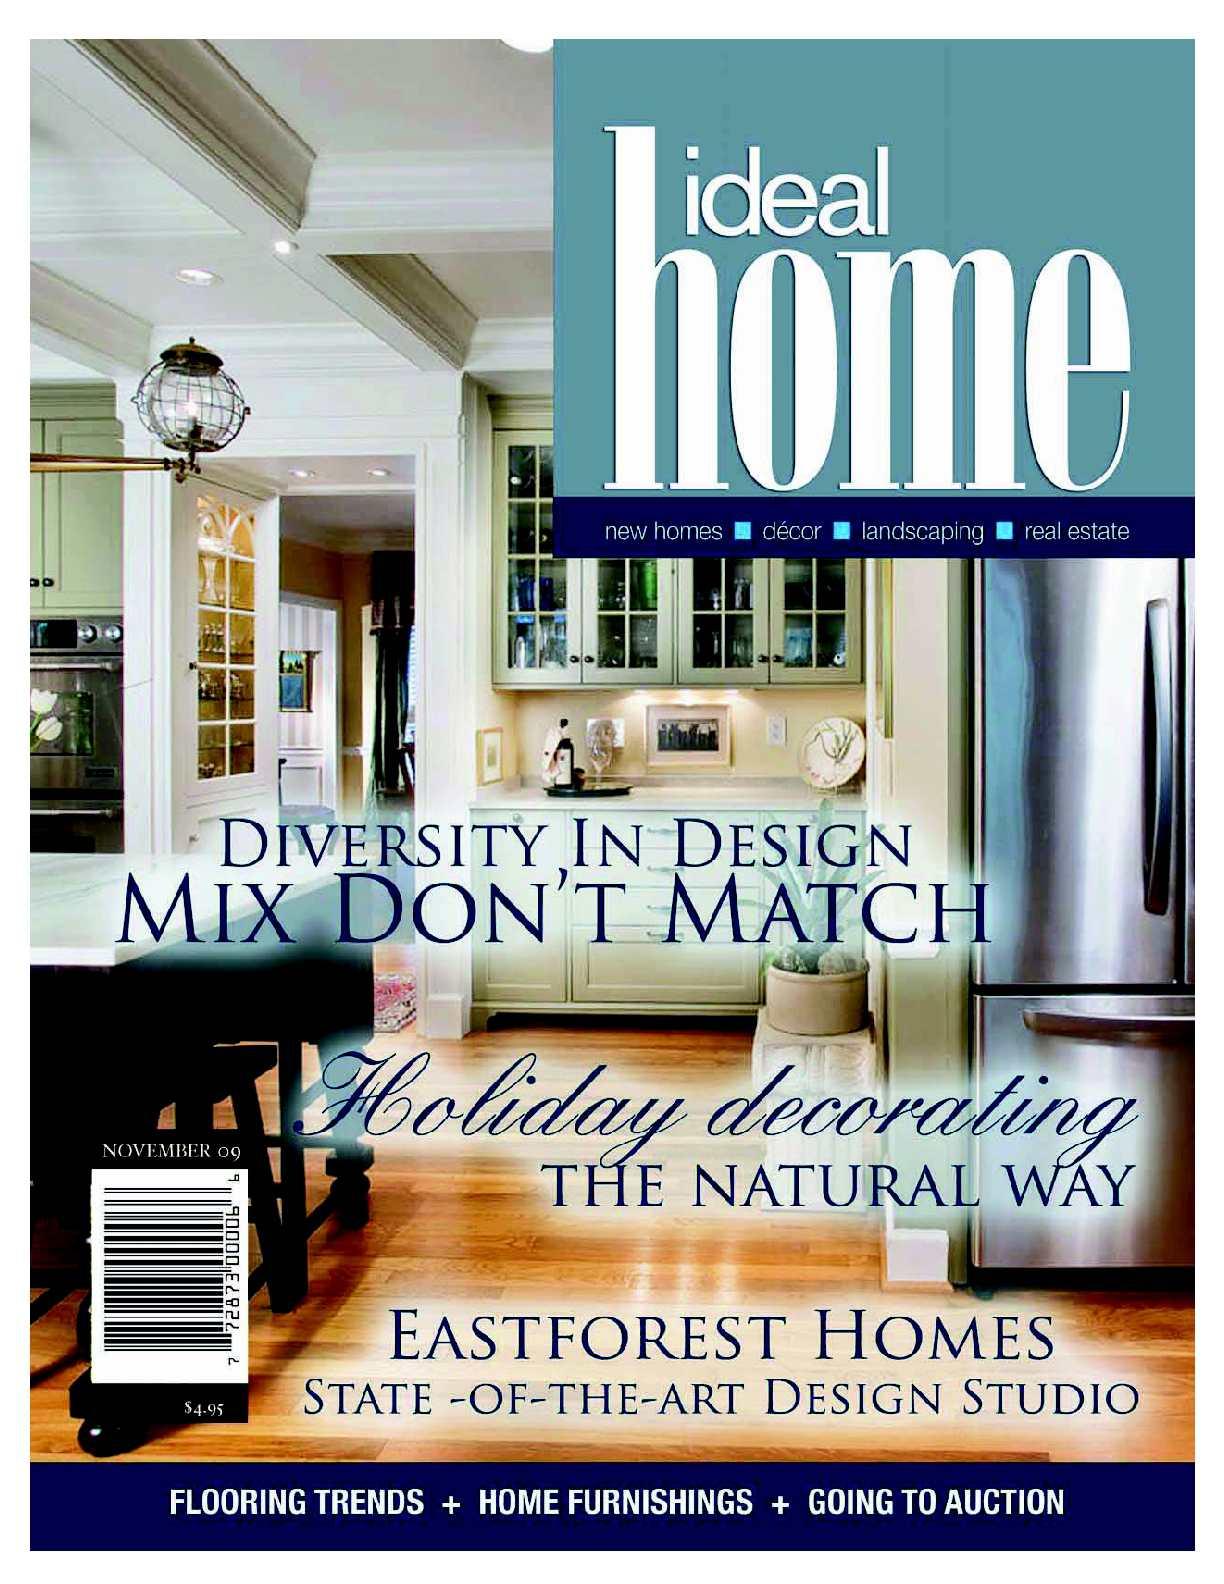 Design Studio Eastforest Homes